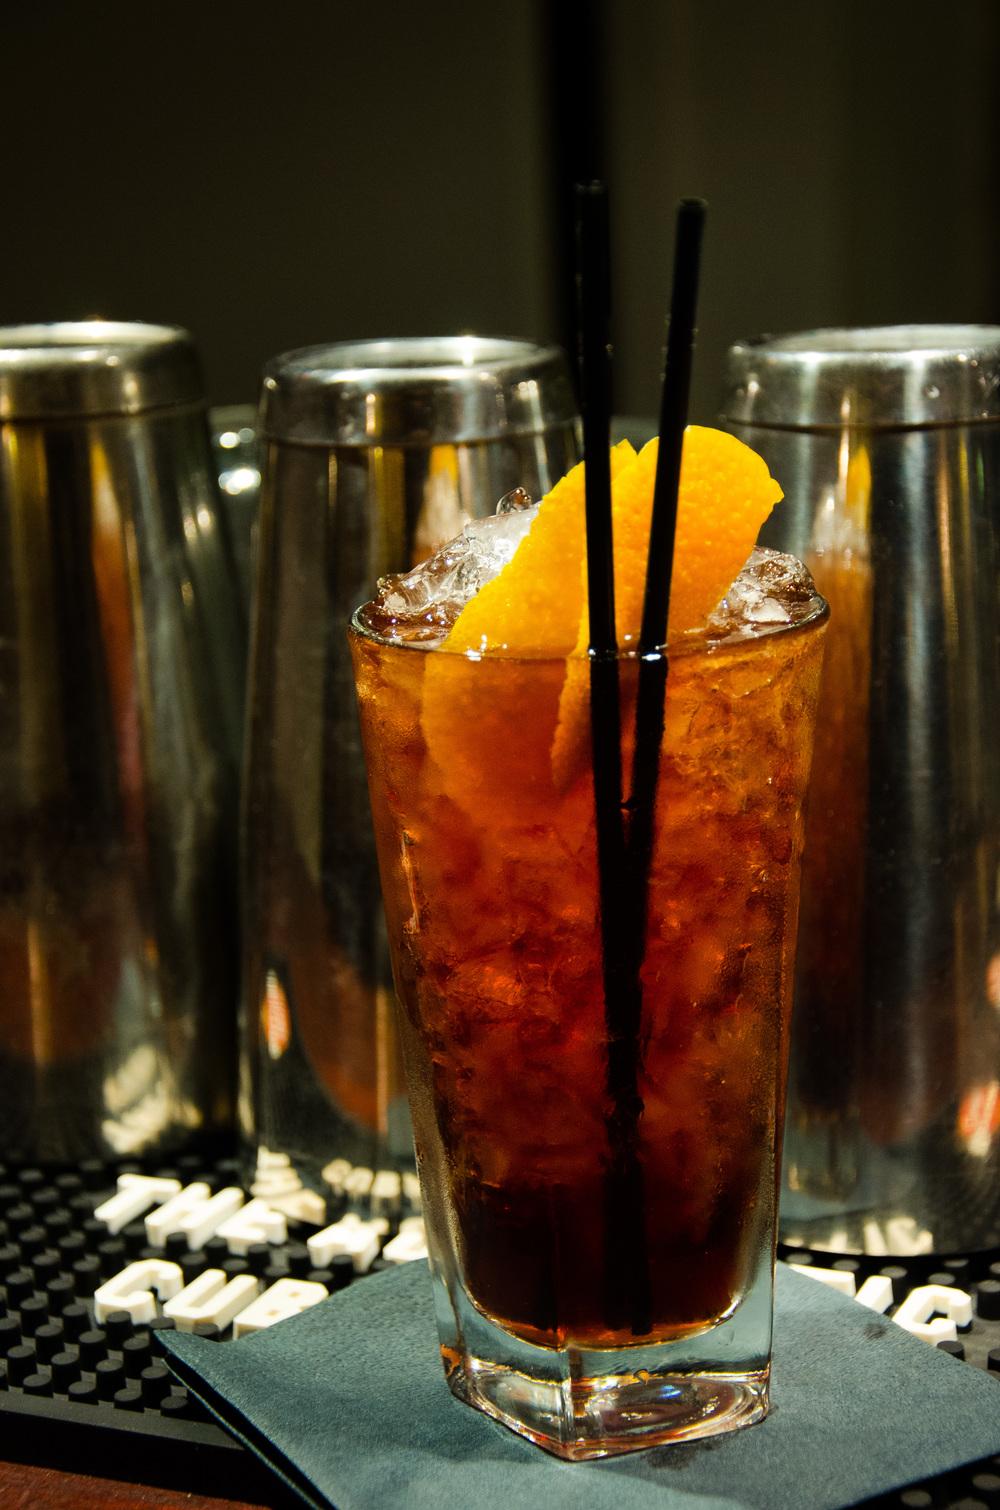 Cocktail photo: Jules Abensour